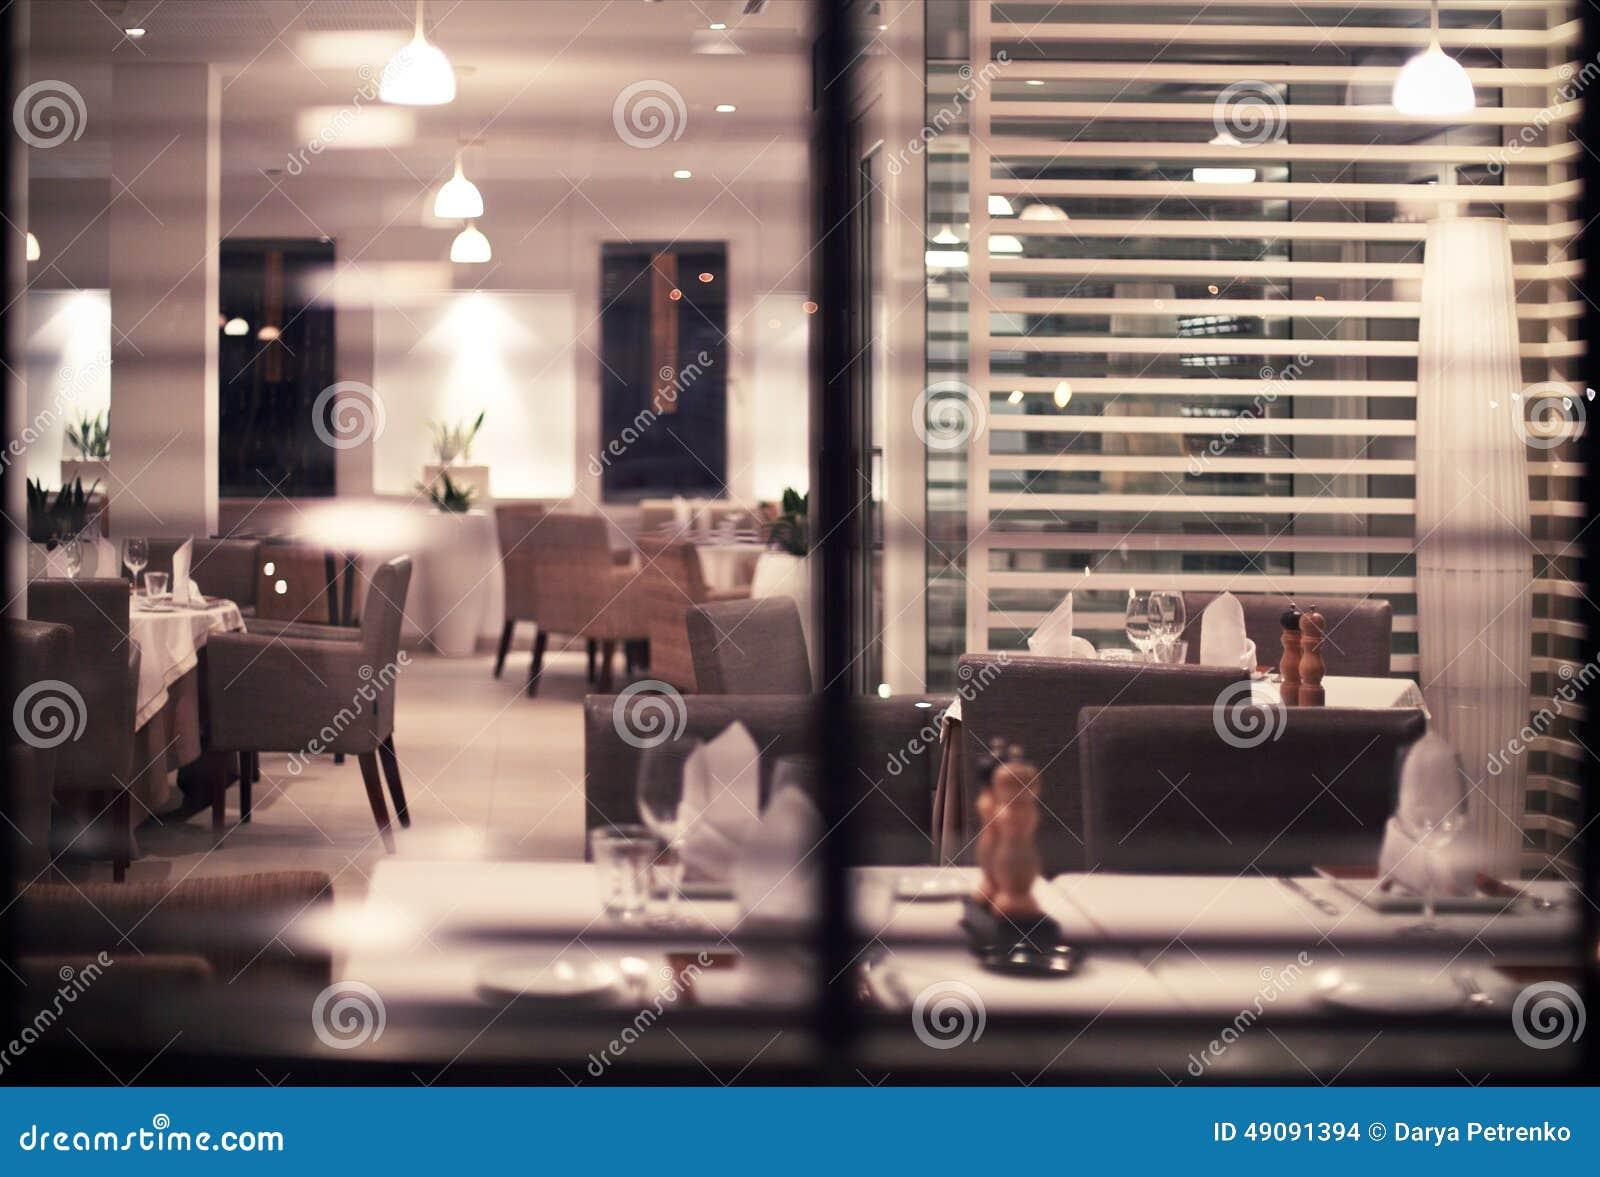 Interior of modern nigt club or restaurant